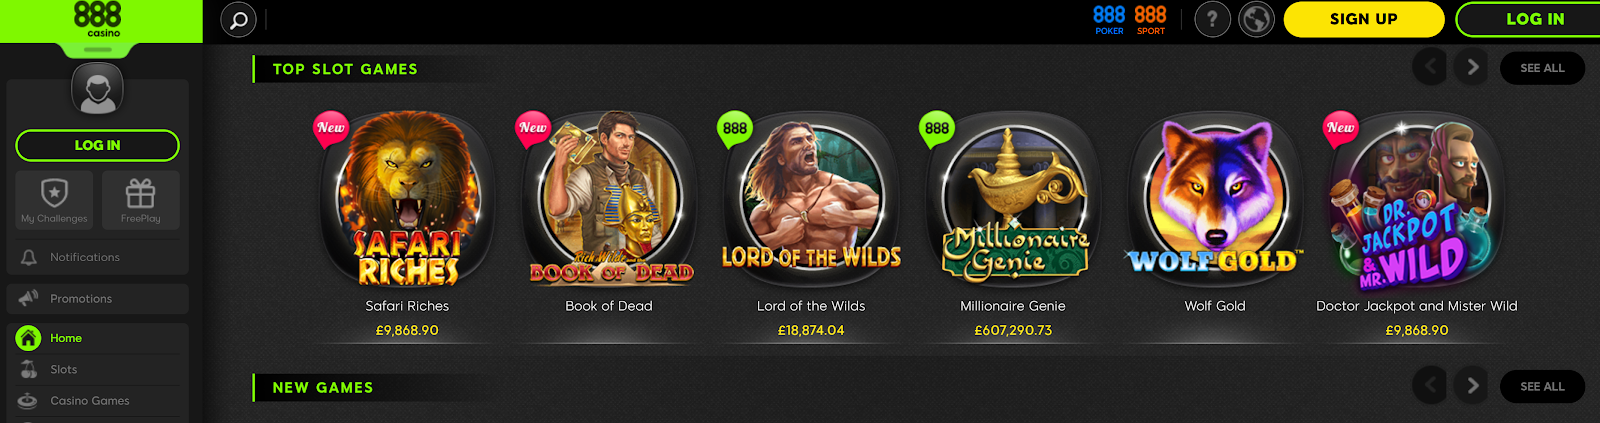 888 Casino is a top-rated slot bonus site